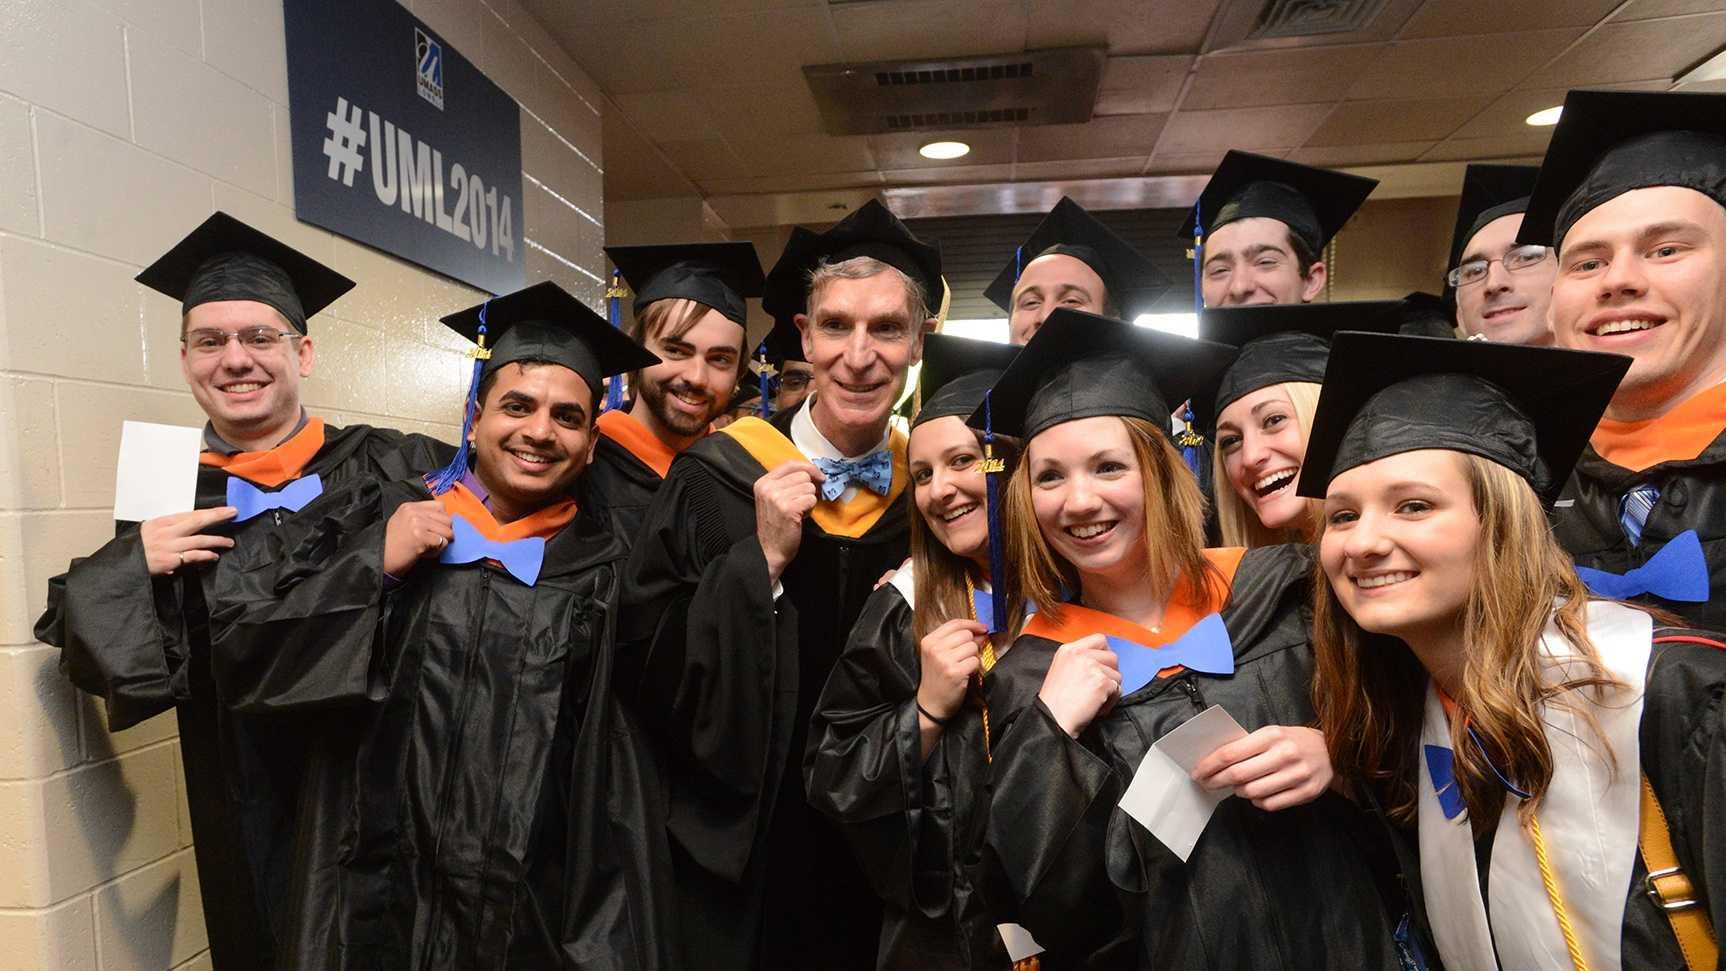 Nye UMass Lowell students May 17 2014.jpg